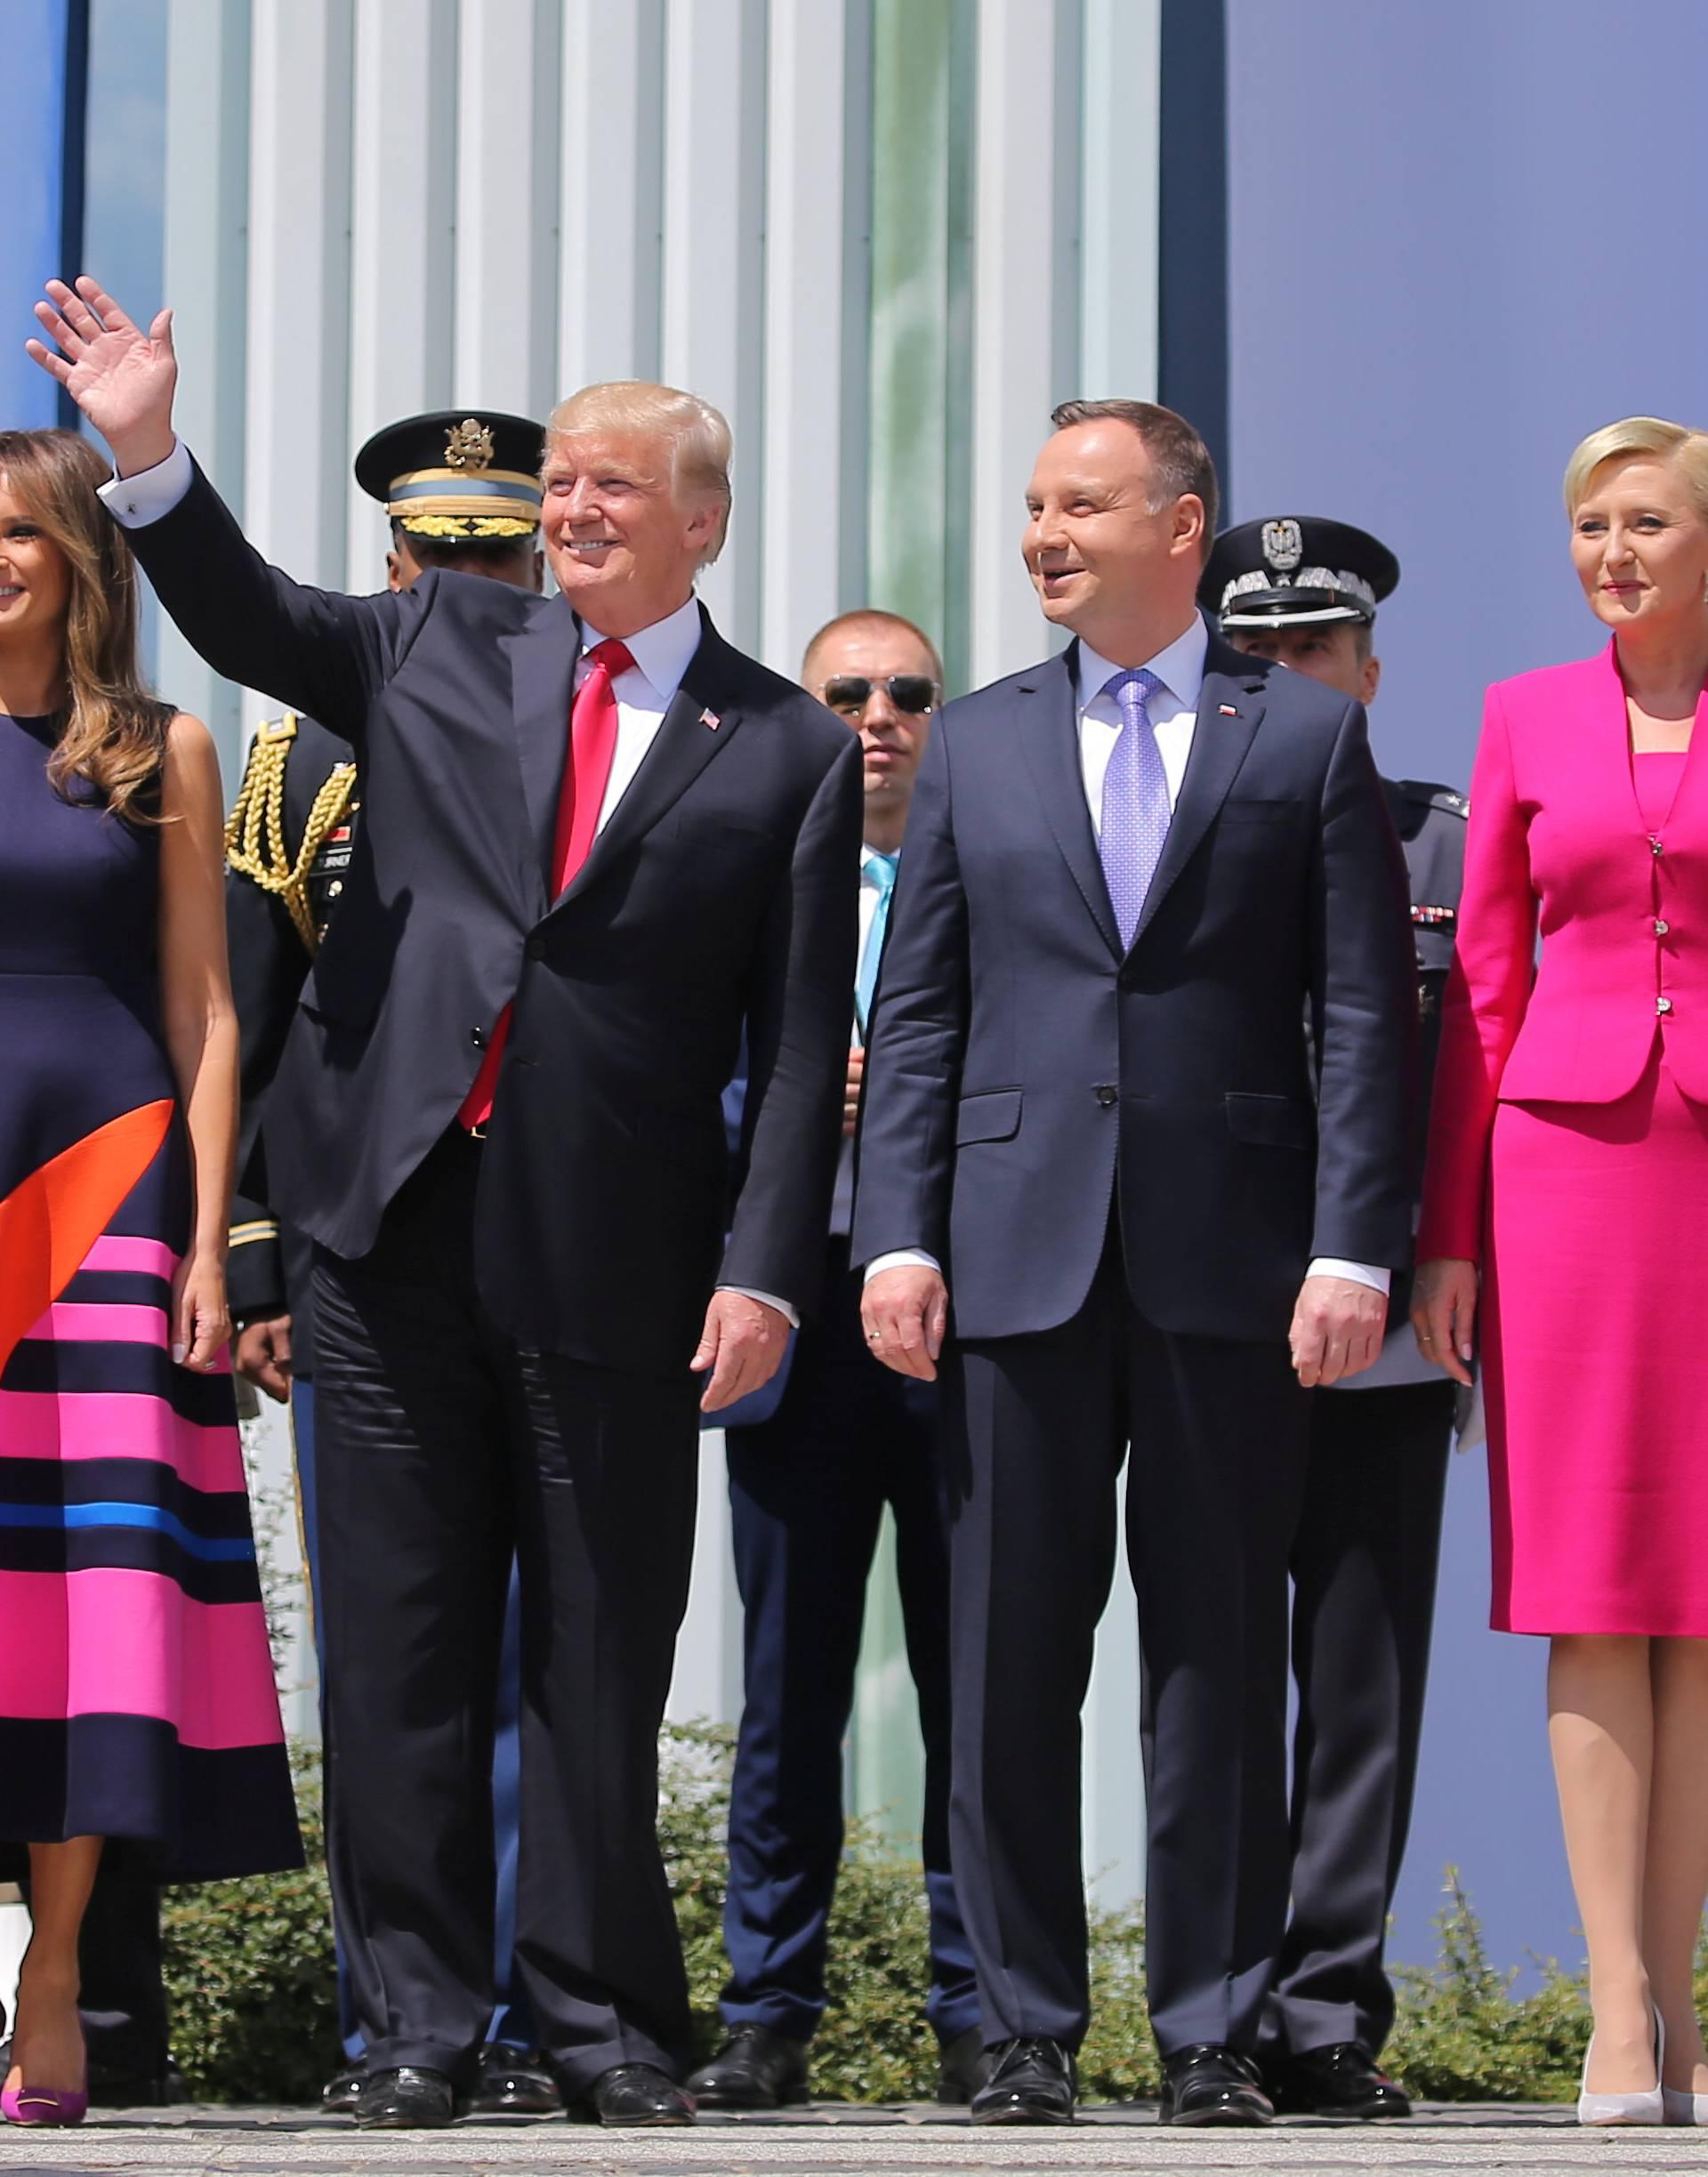 U.S. President Donald Trump gives a public speech at Krasinski Square in Warsaw